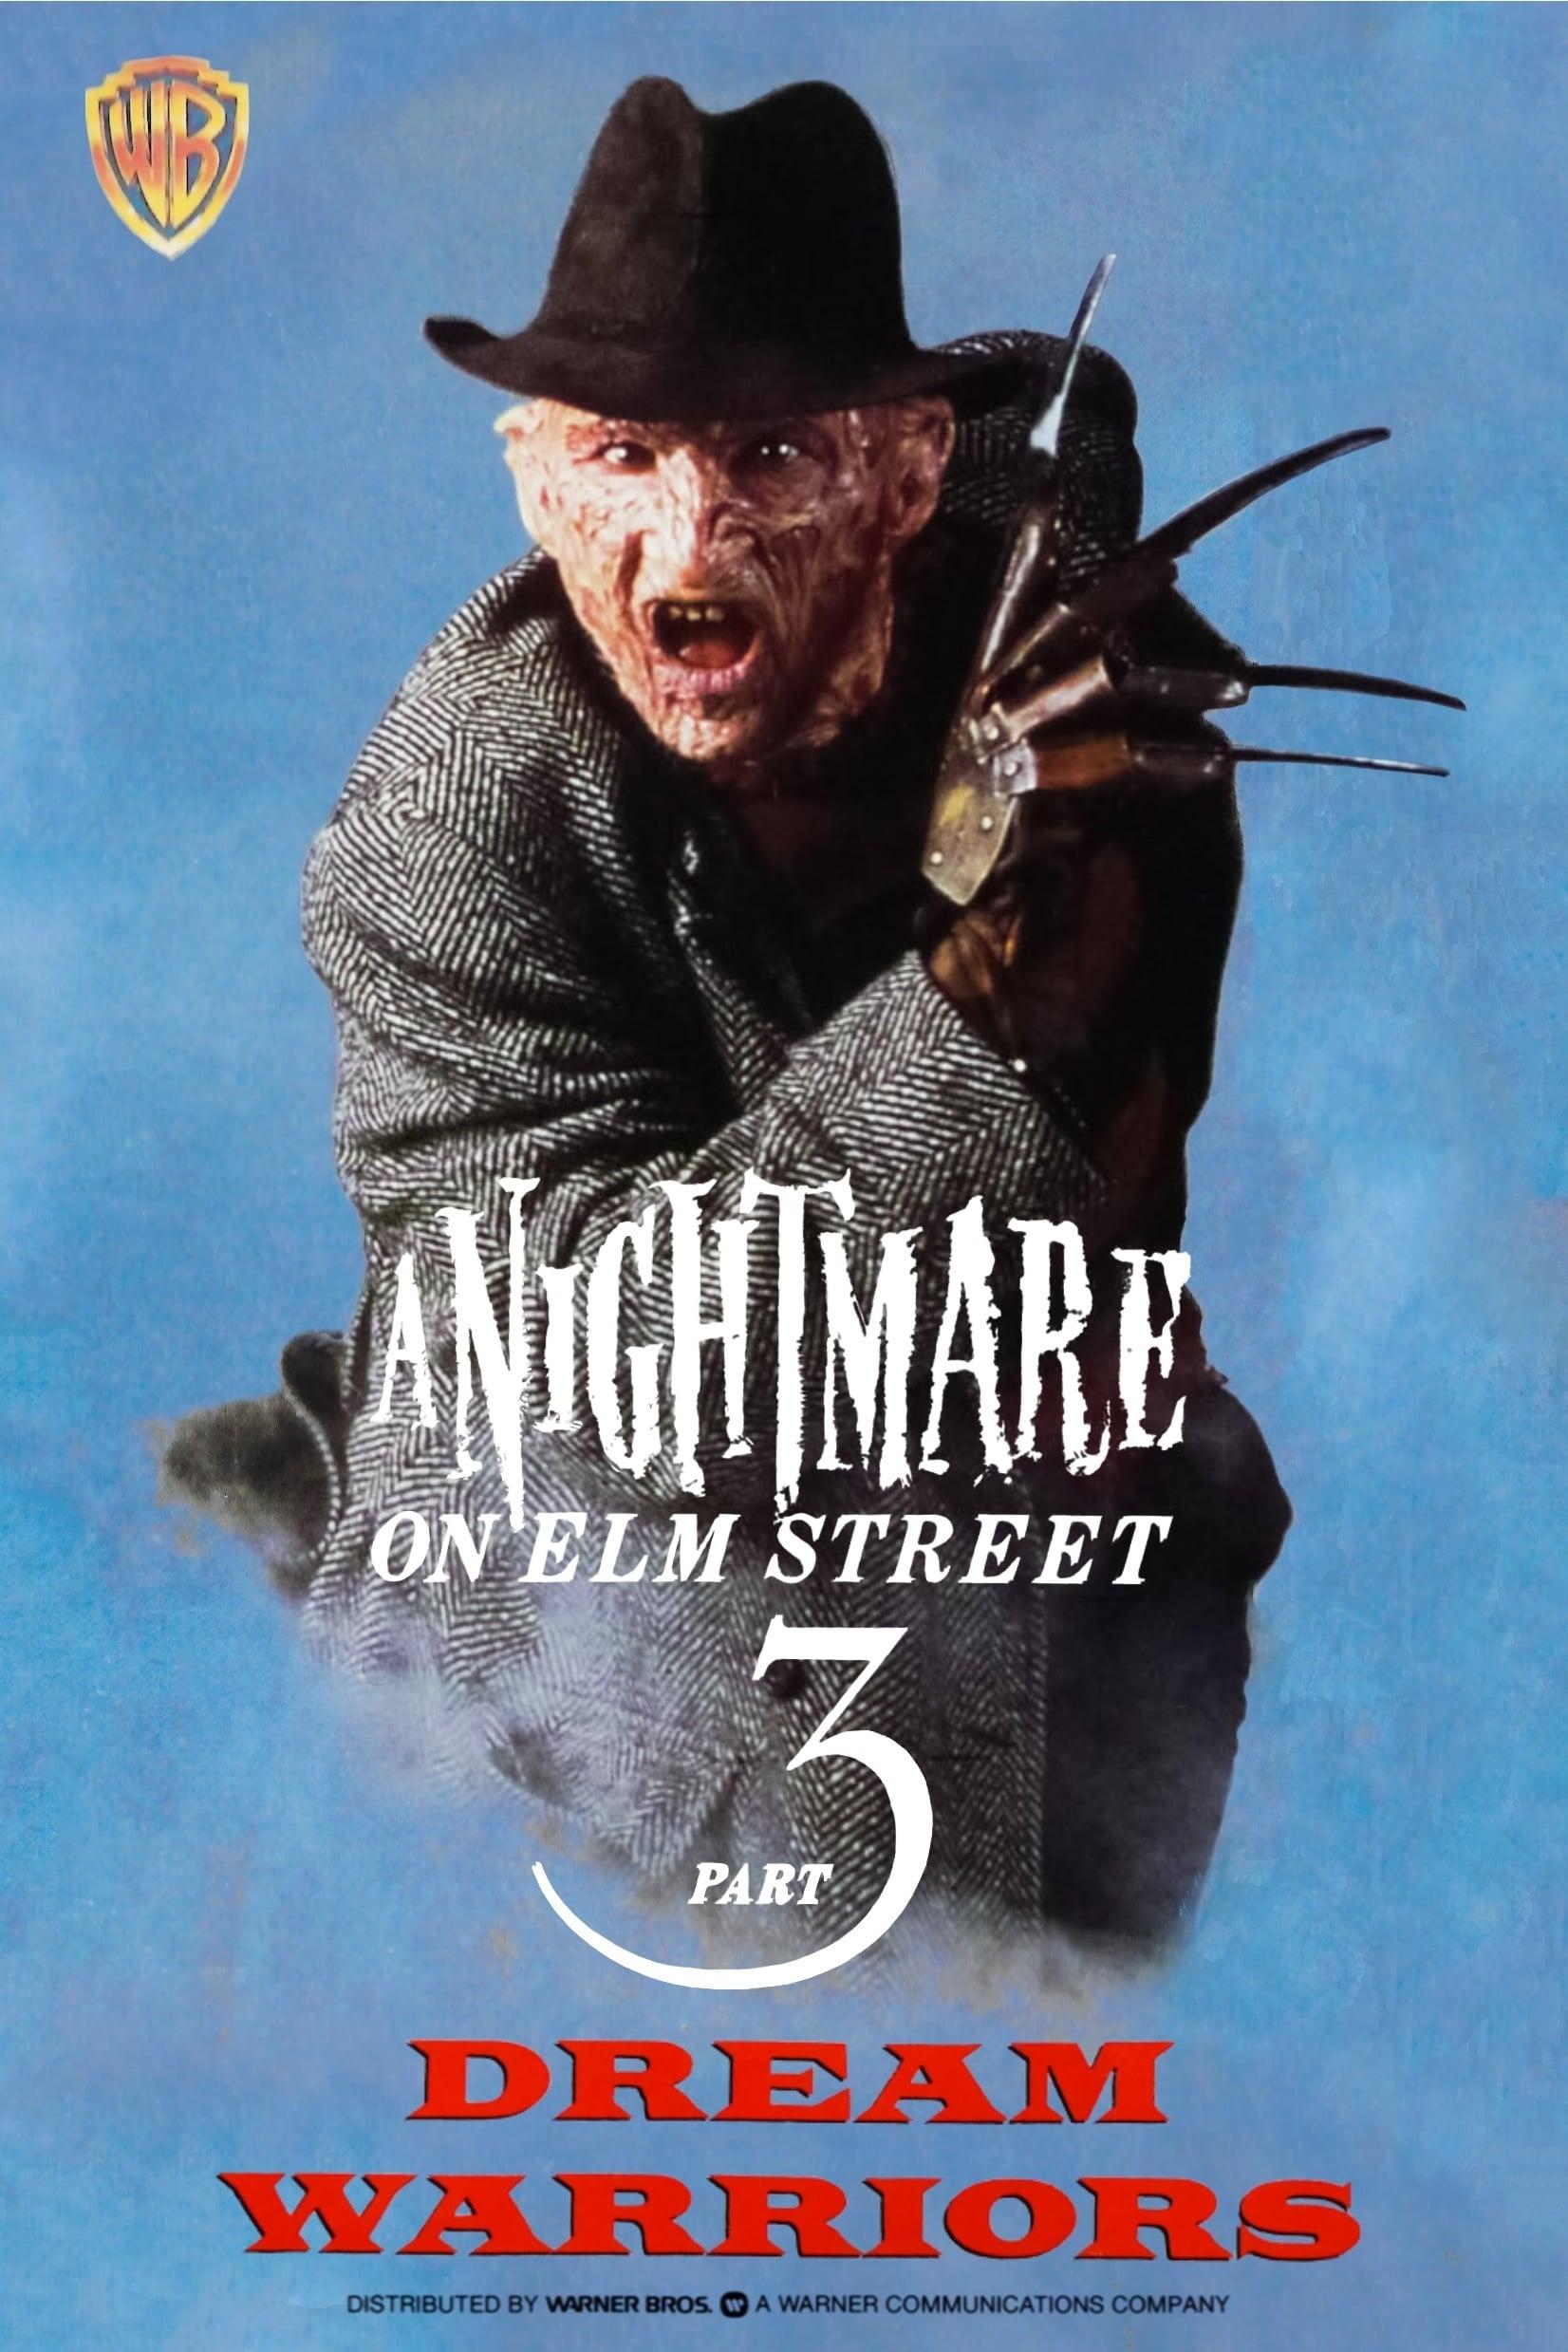 a nightmare on elm street 3 dream warriors 1987 the movie